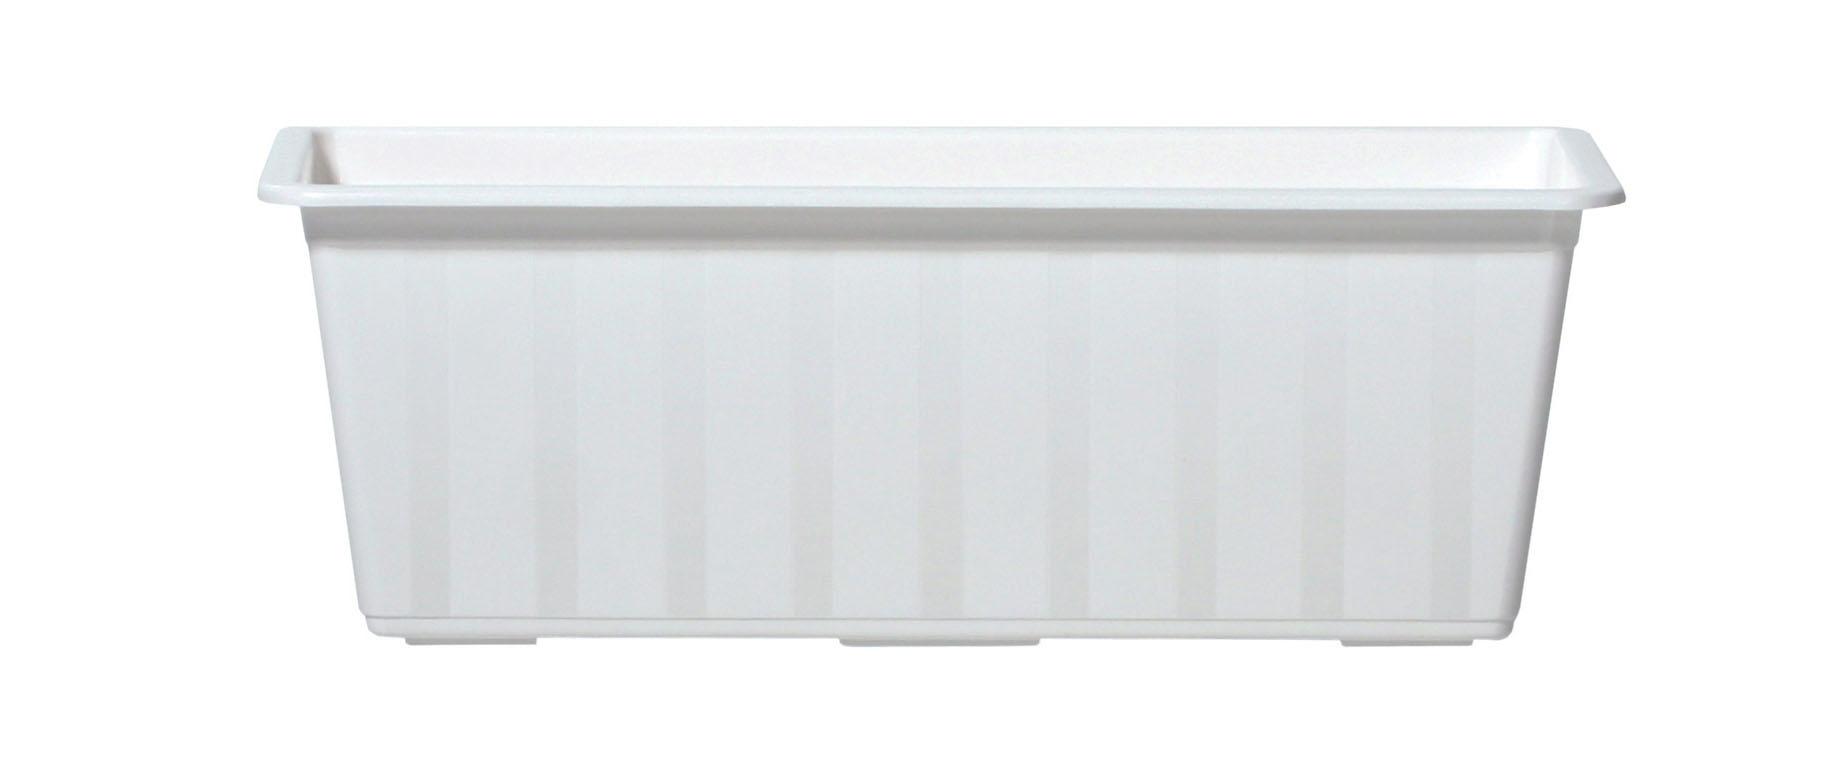 PROSPERPLAST Truhlík AGRO bílý 70cm